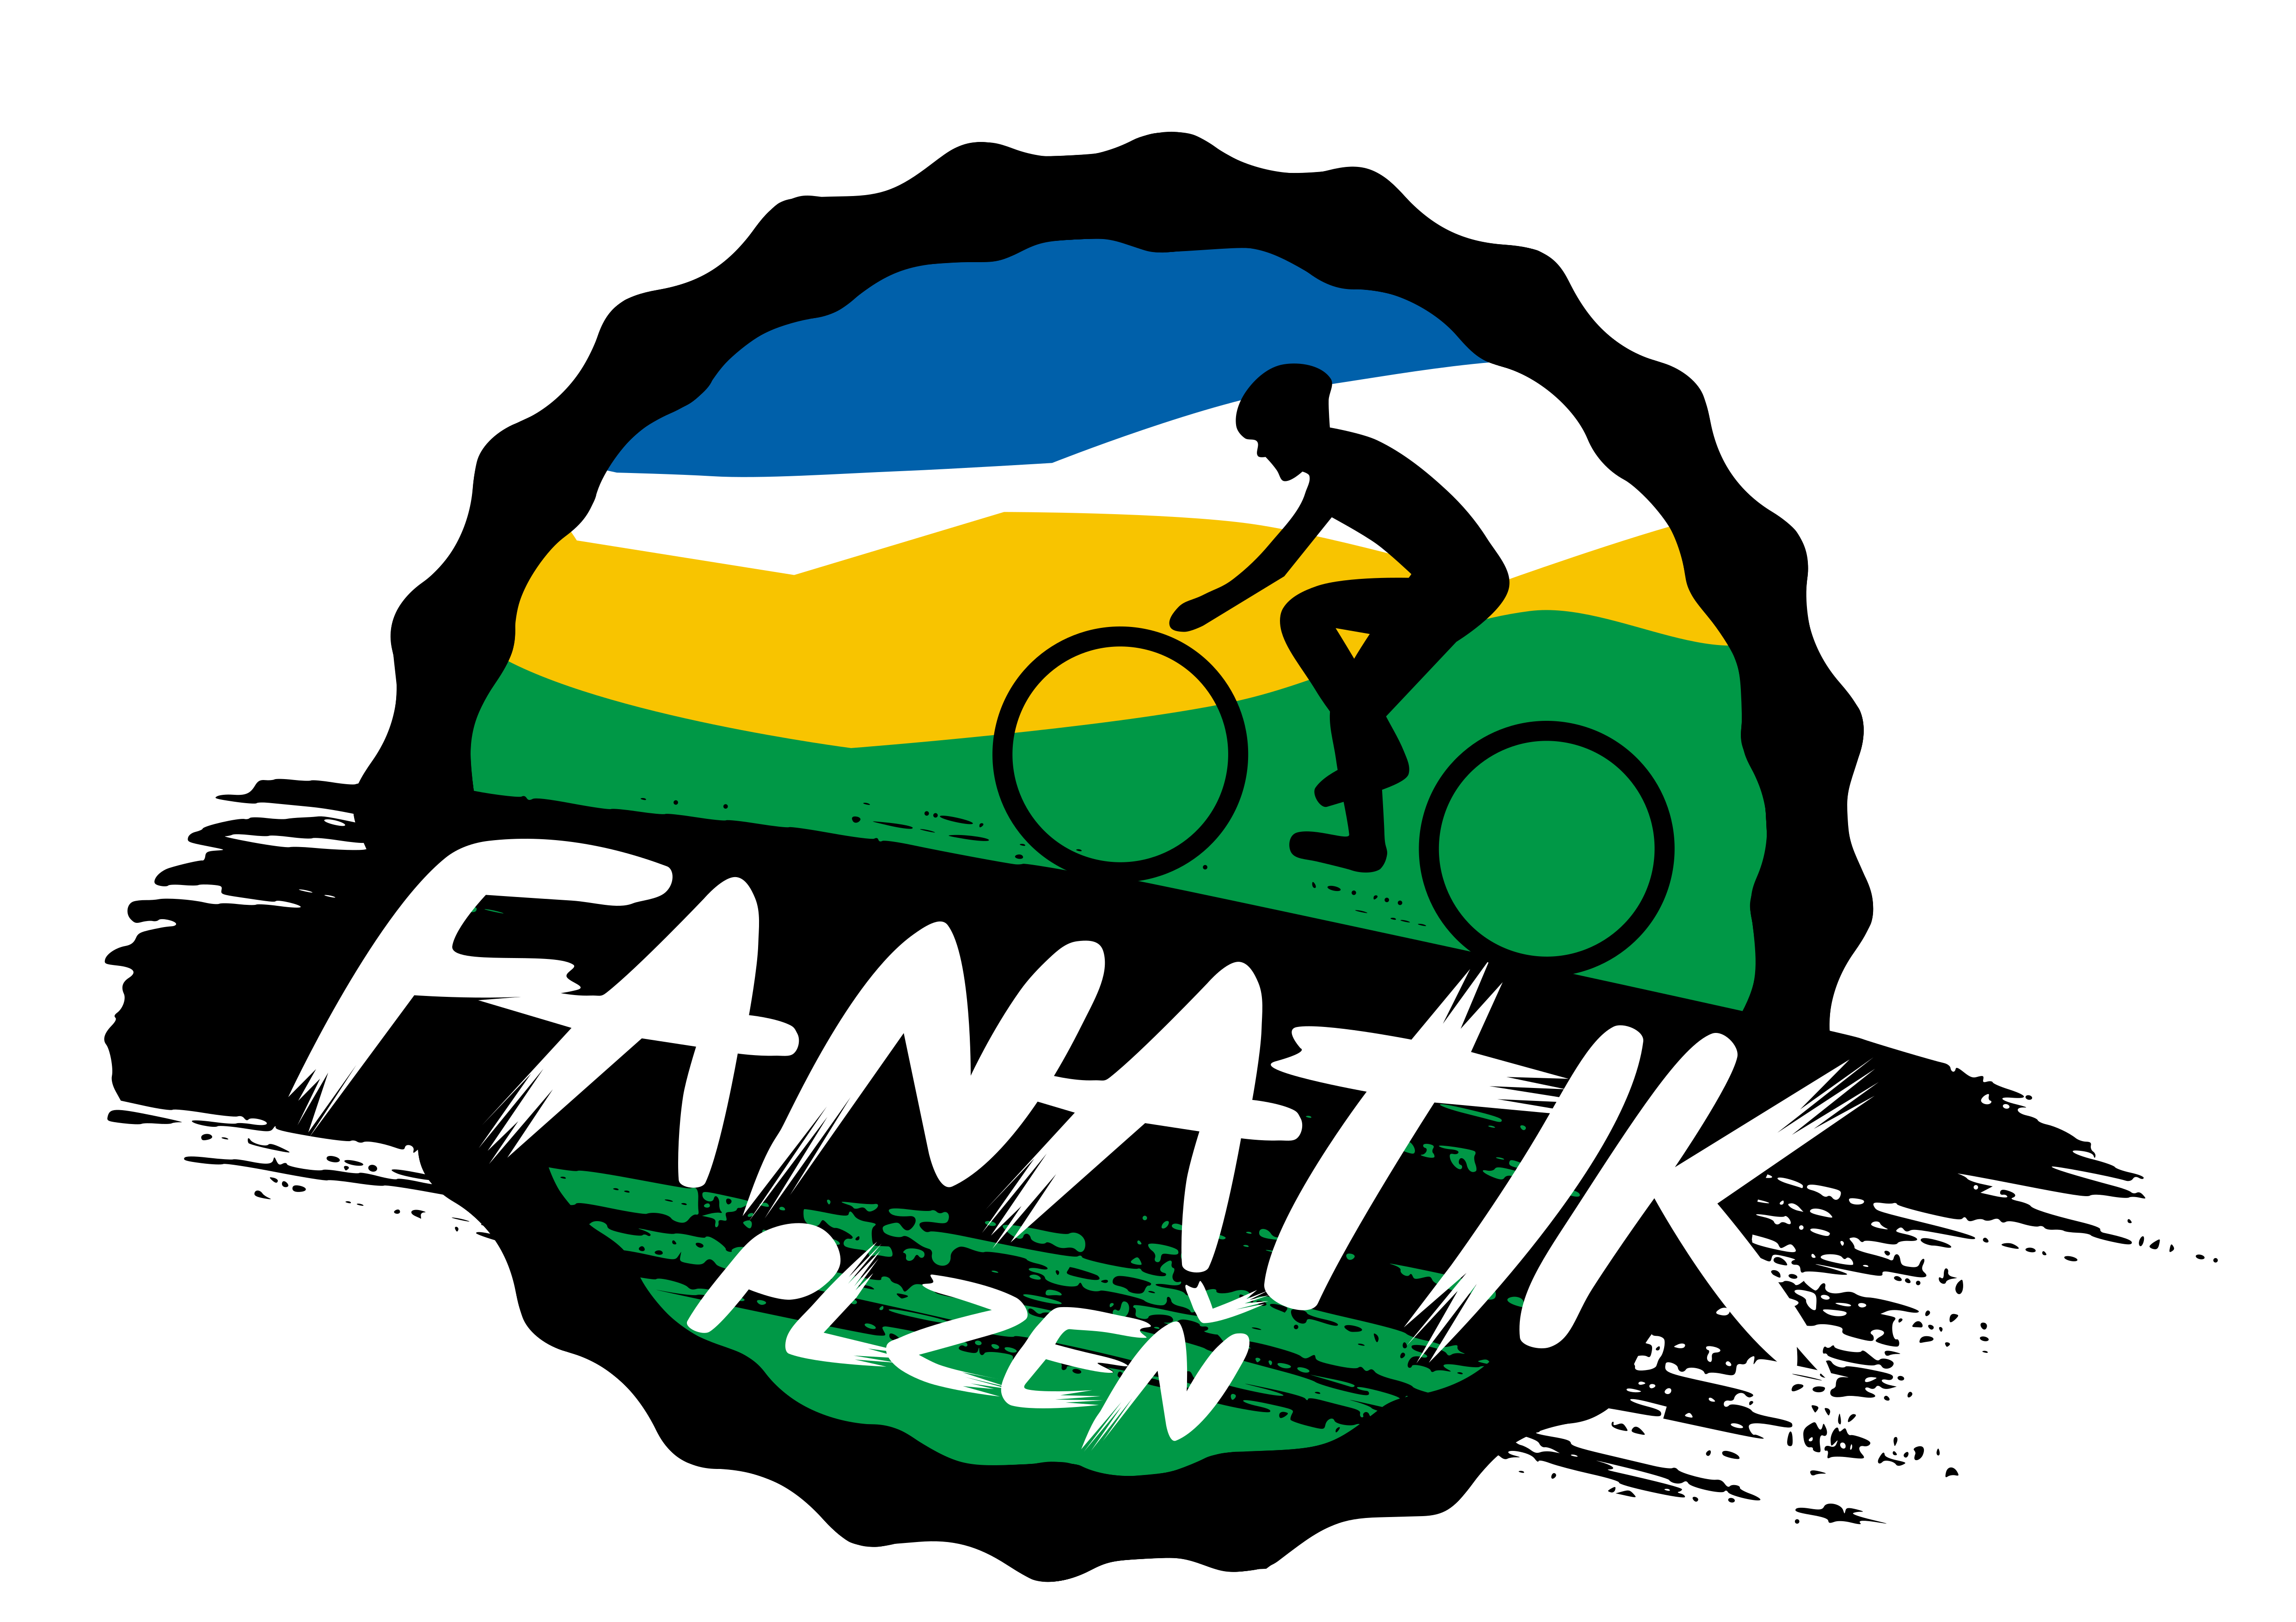 https://www.kempy-chaty.cz/sites/default/files/turistika/fanatik_logo_barva_0.png